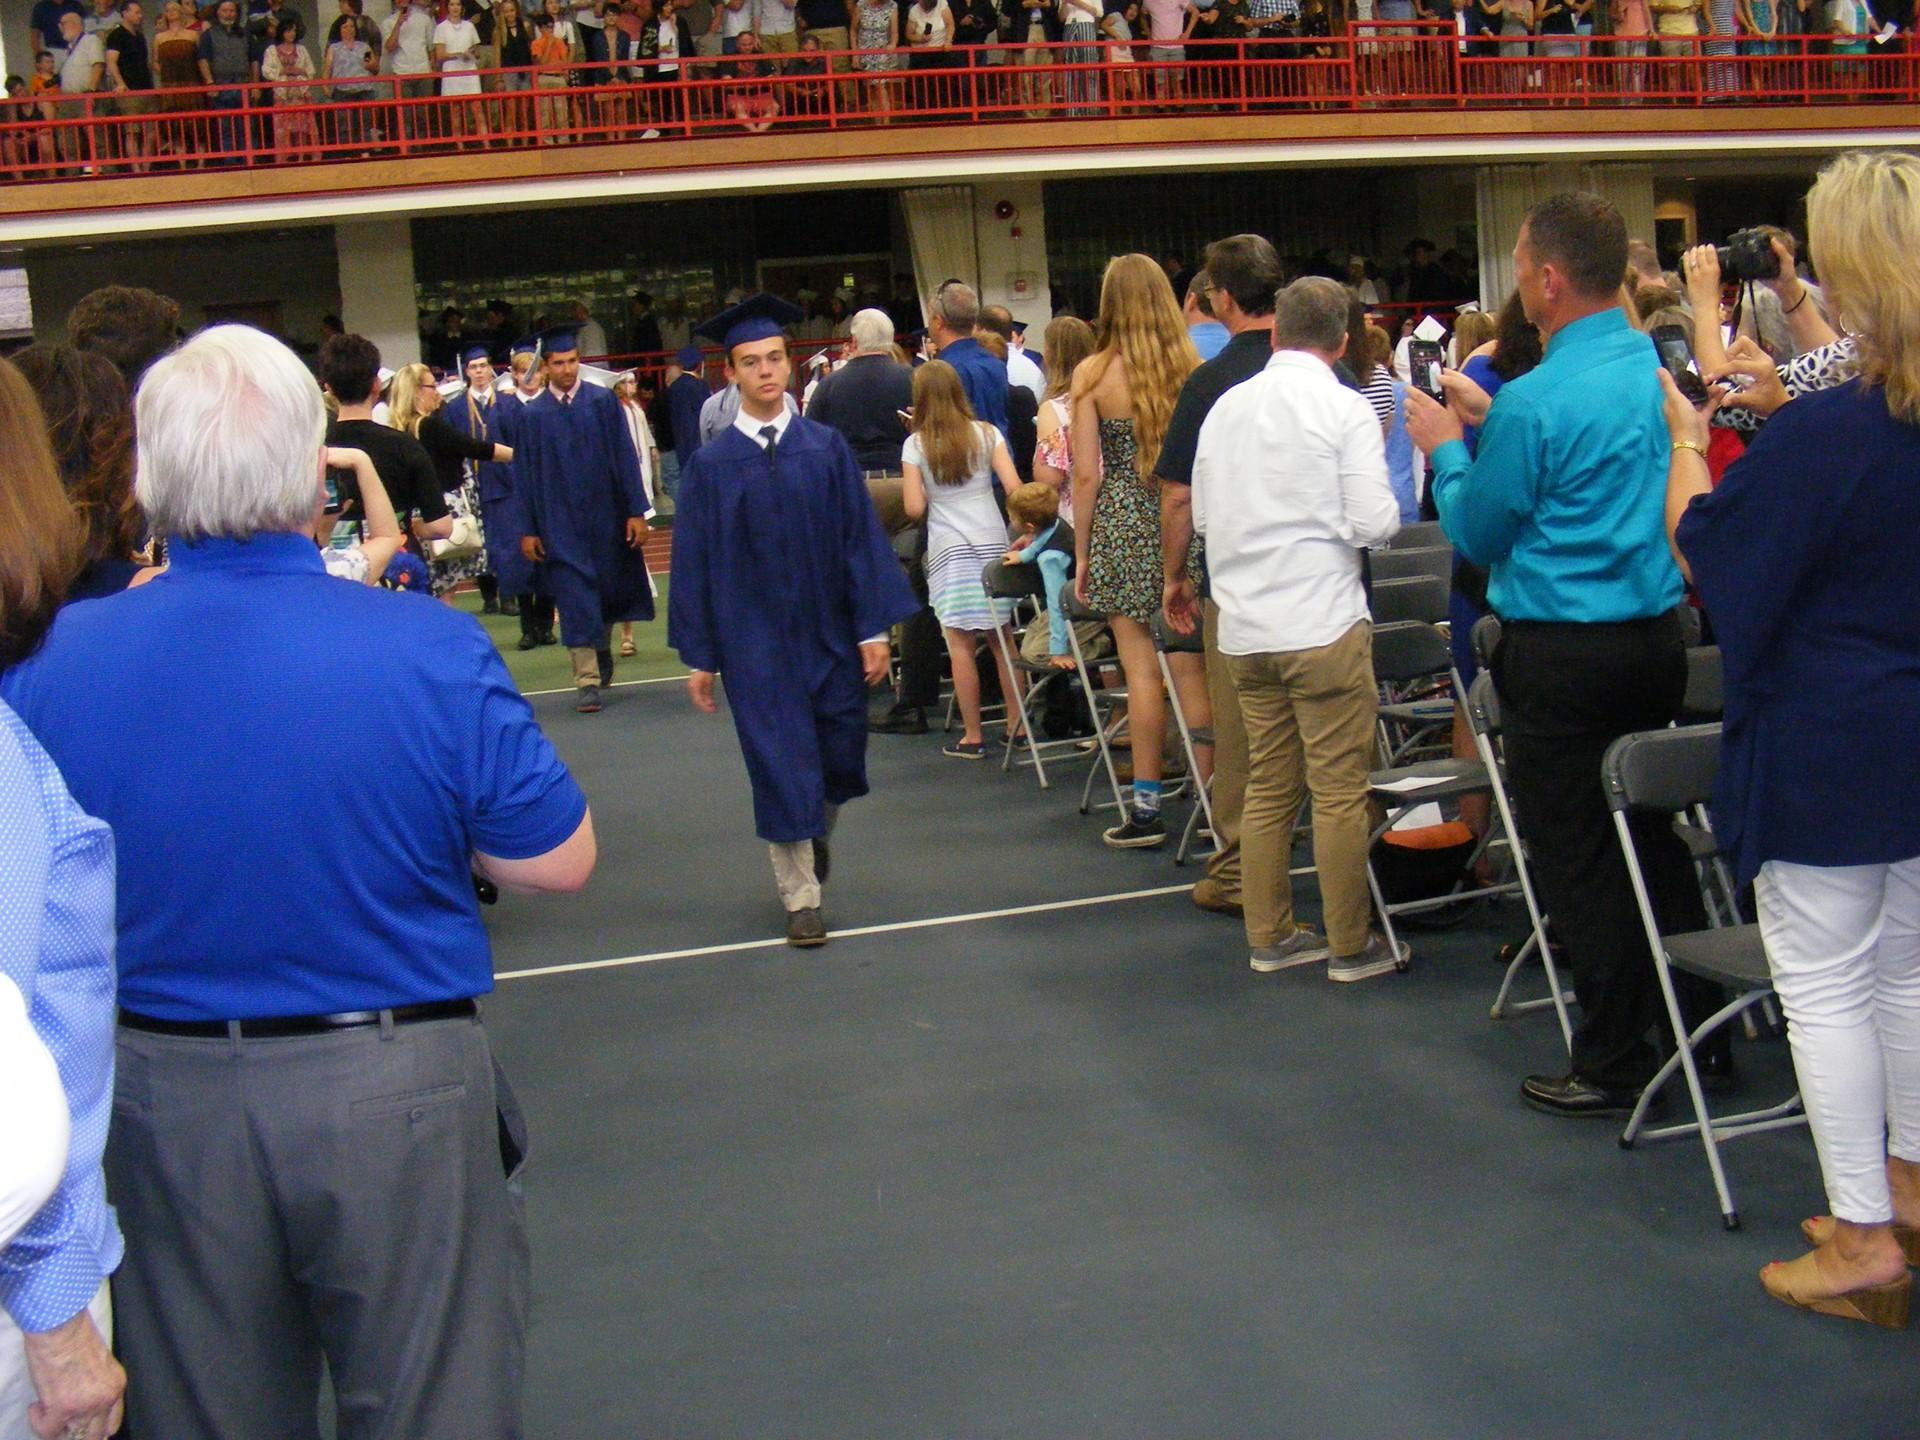 Class of 2017 Graduation - Procession